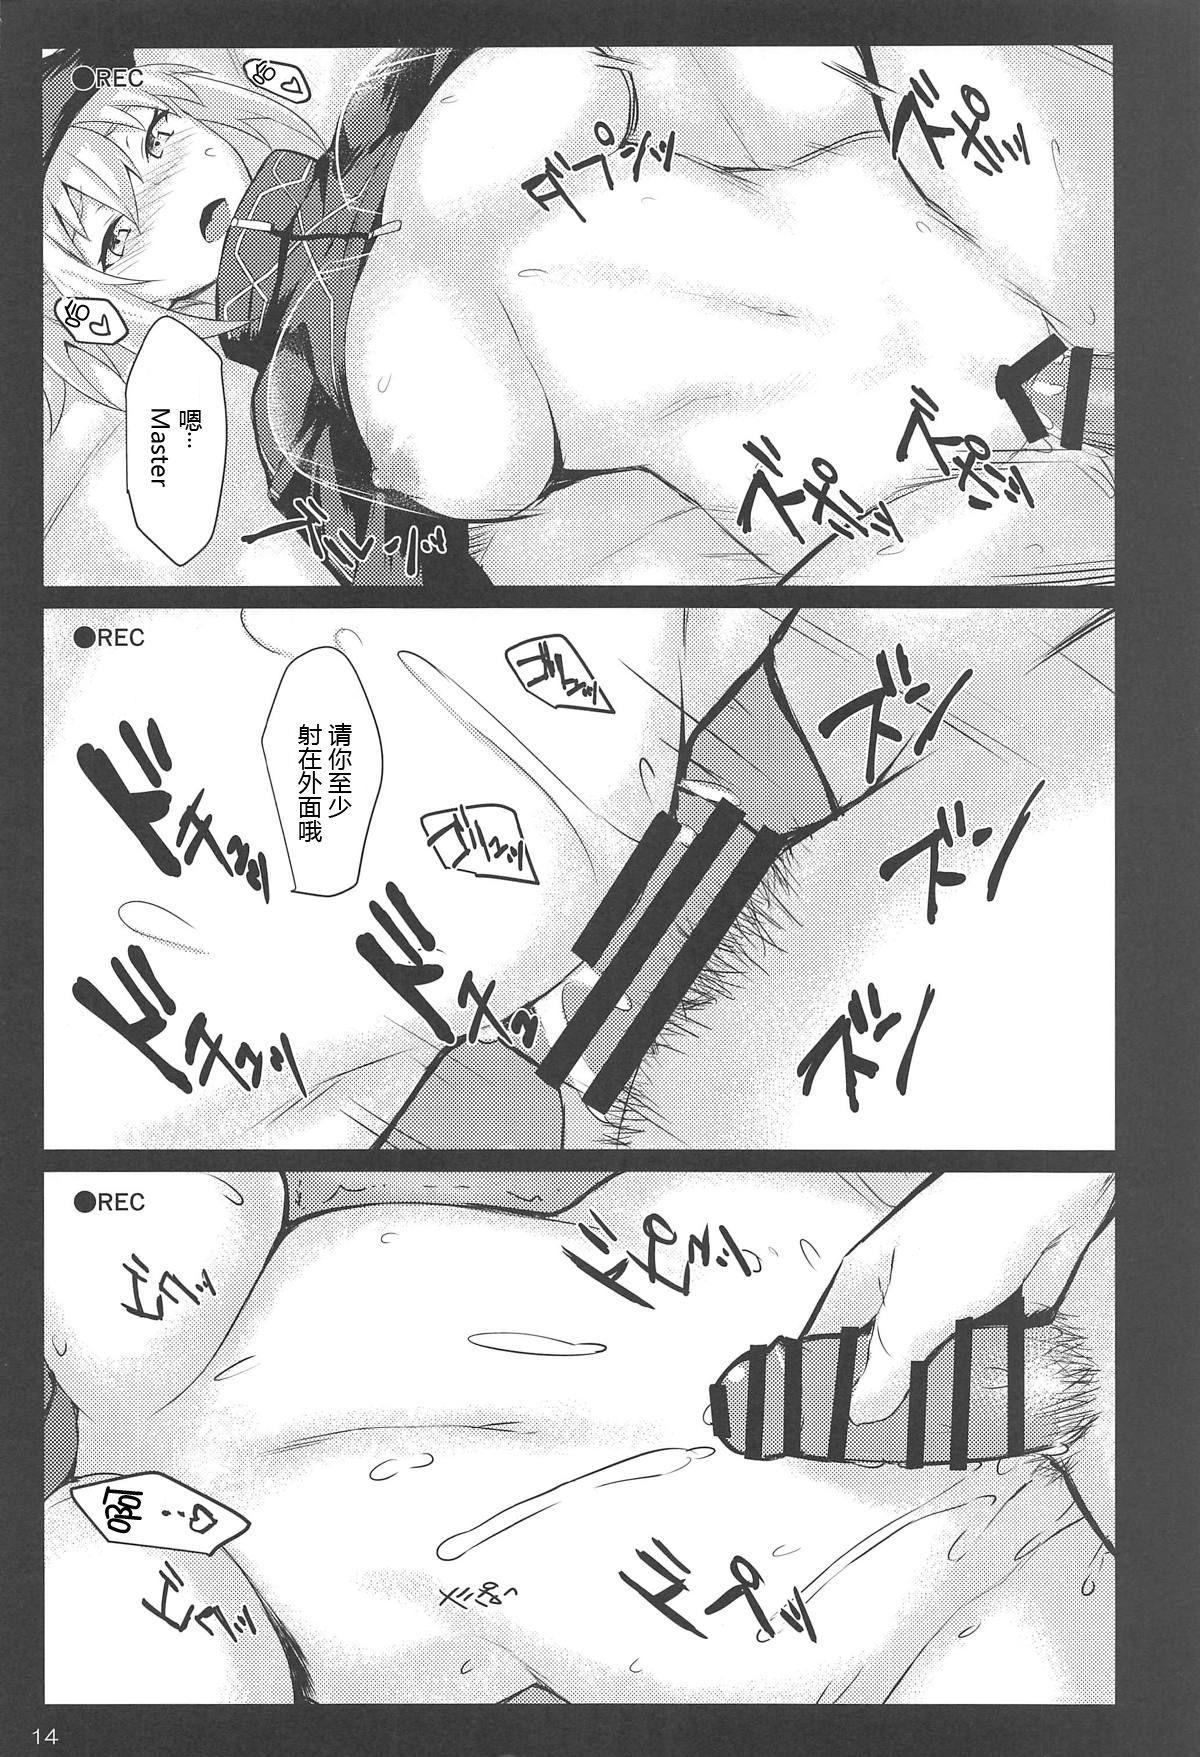 Beit Kankaku de Yarasete Kureru XX Layer-san 11